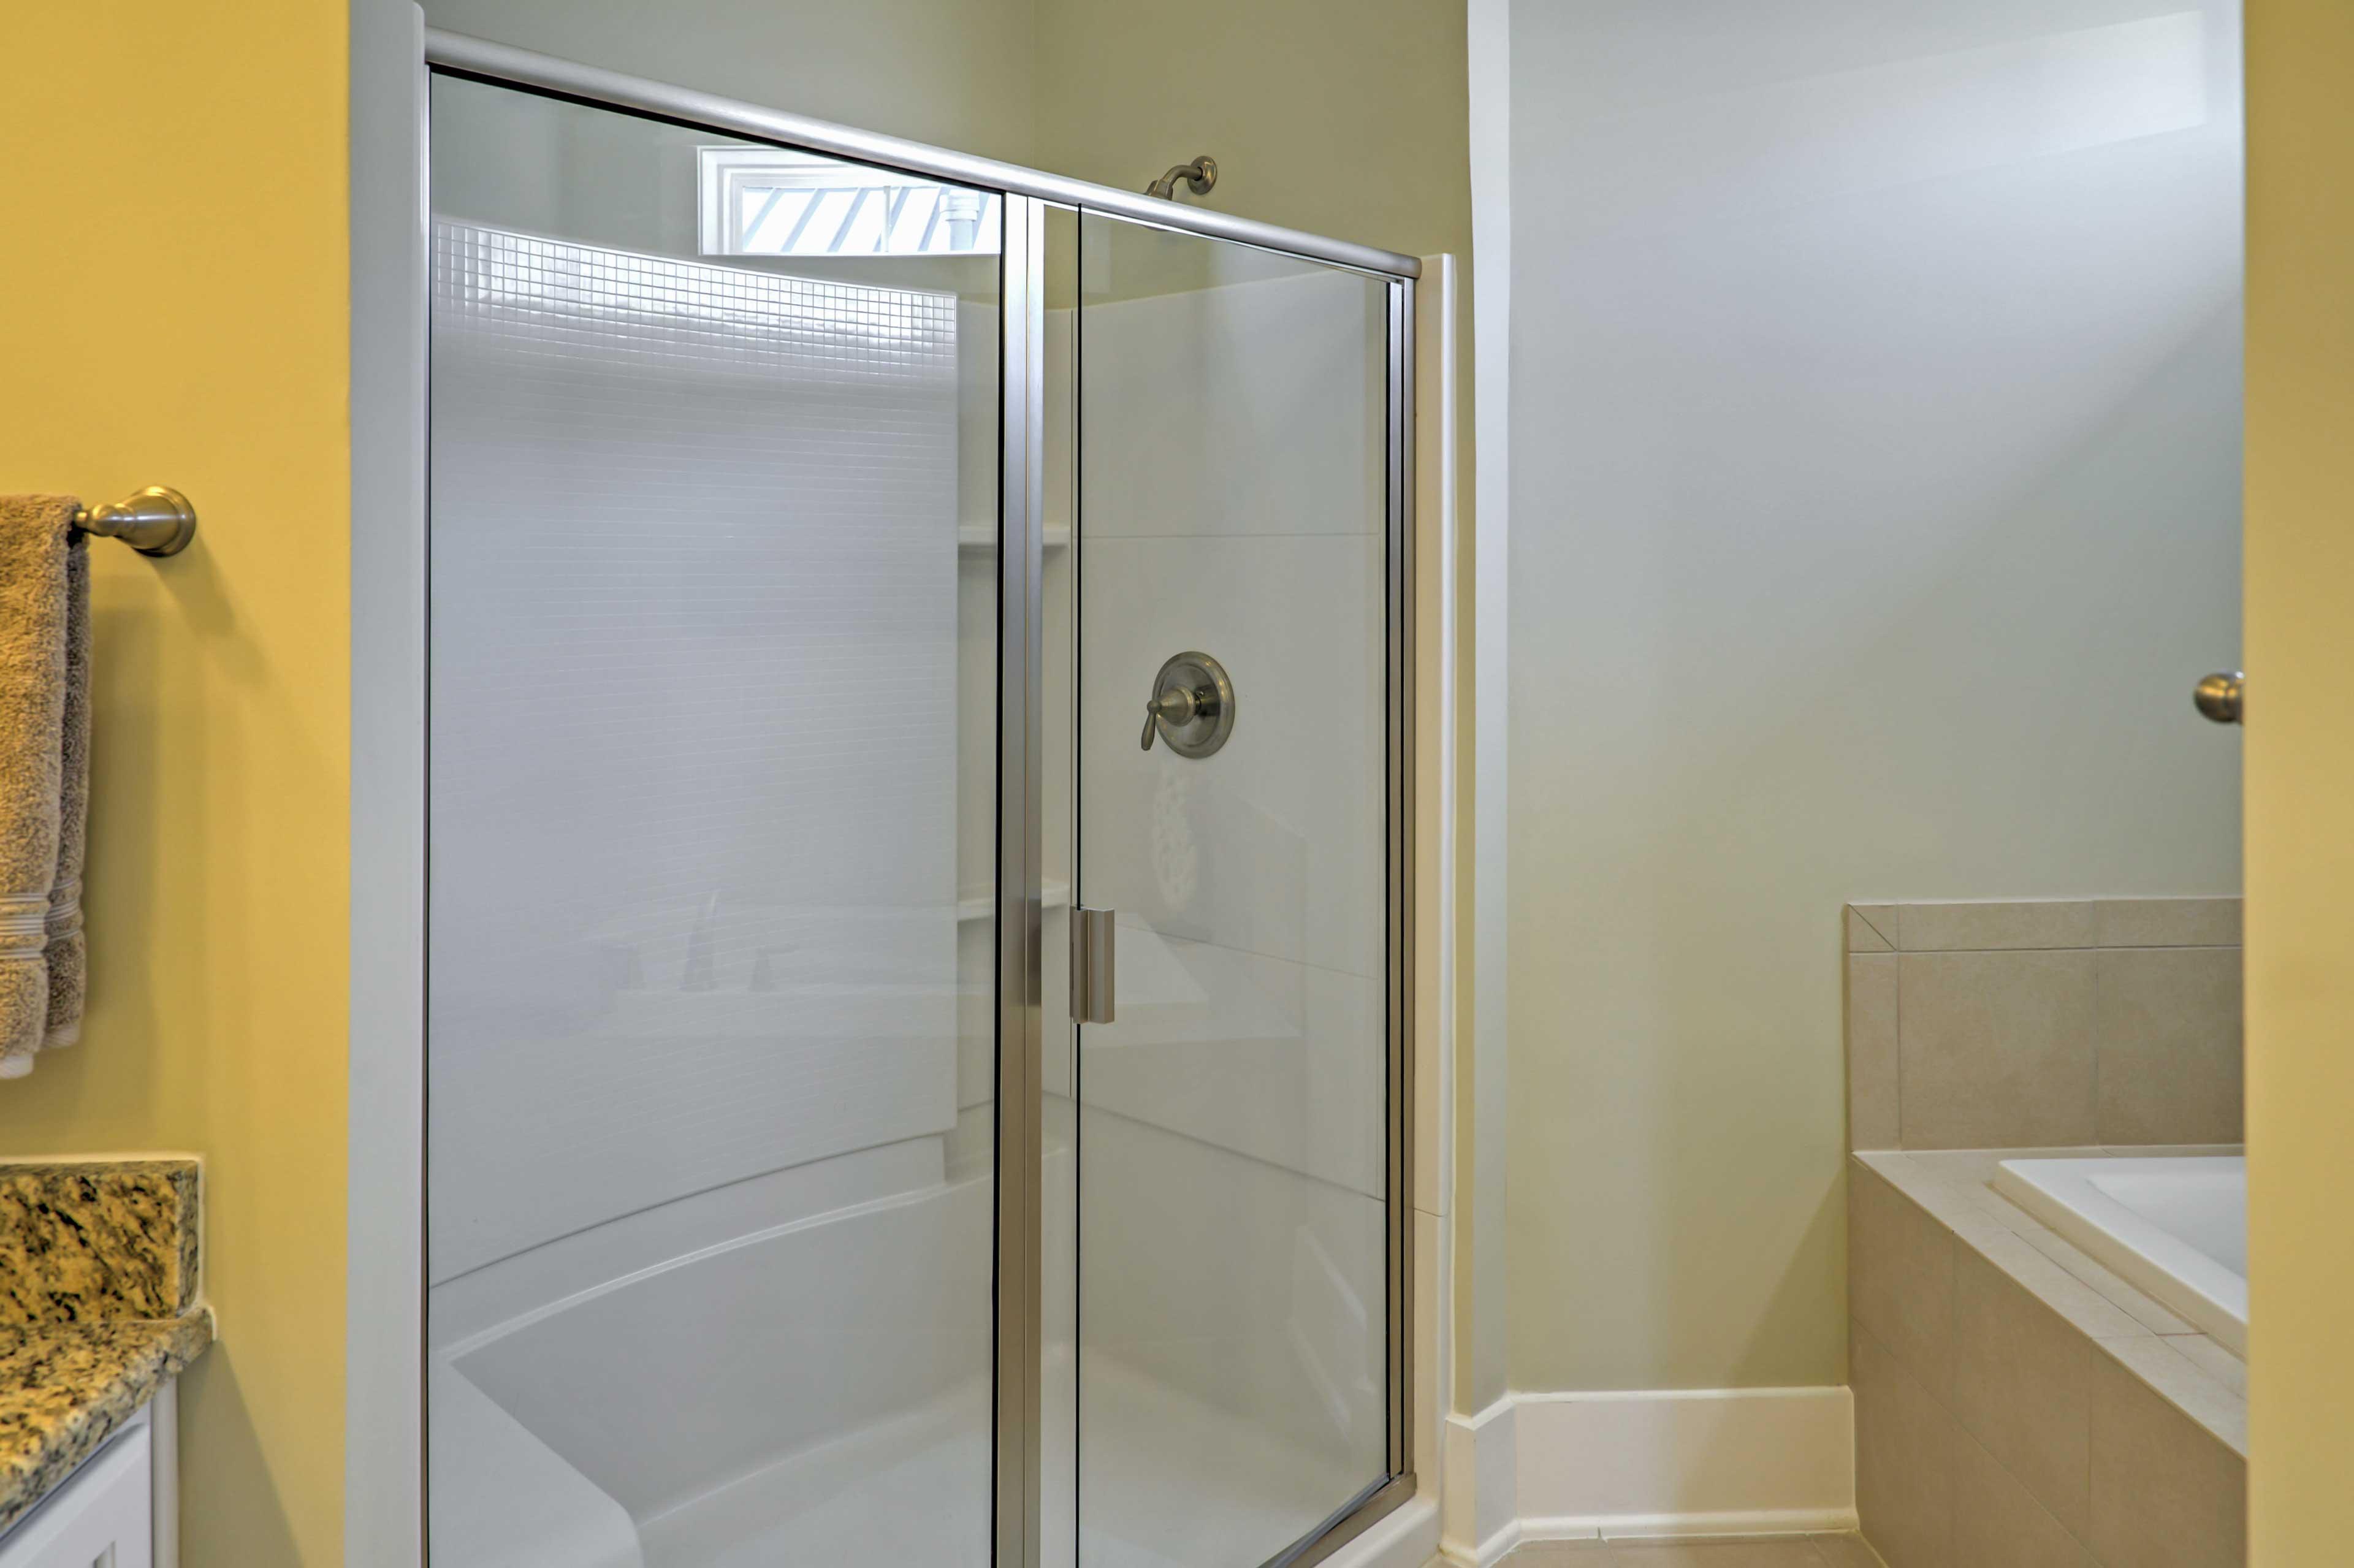 Rinse off in the pristine walk-in shower.